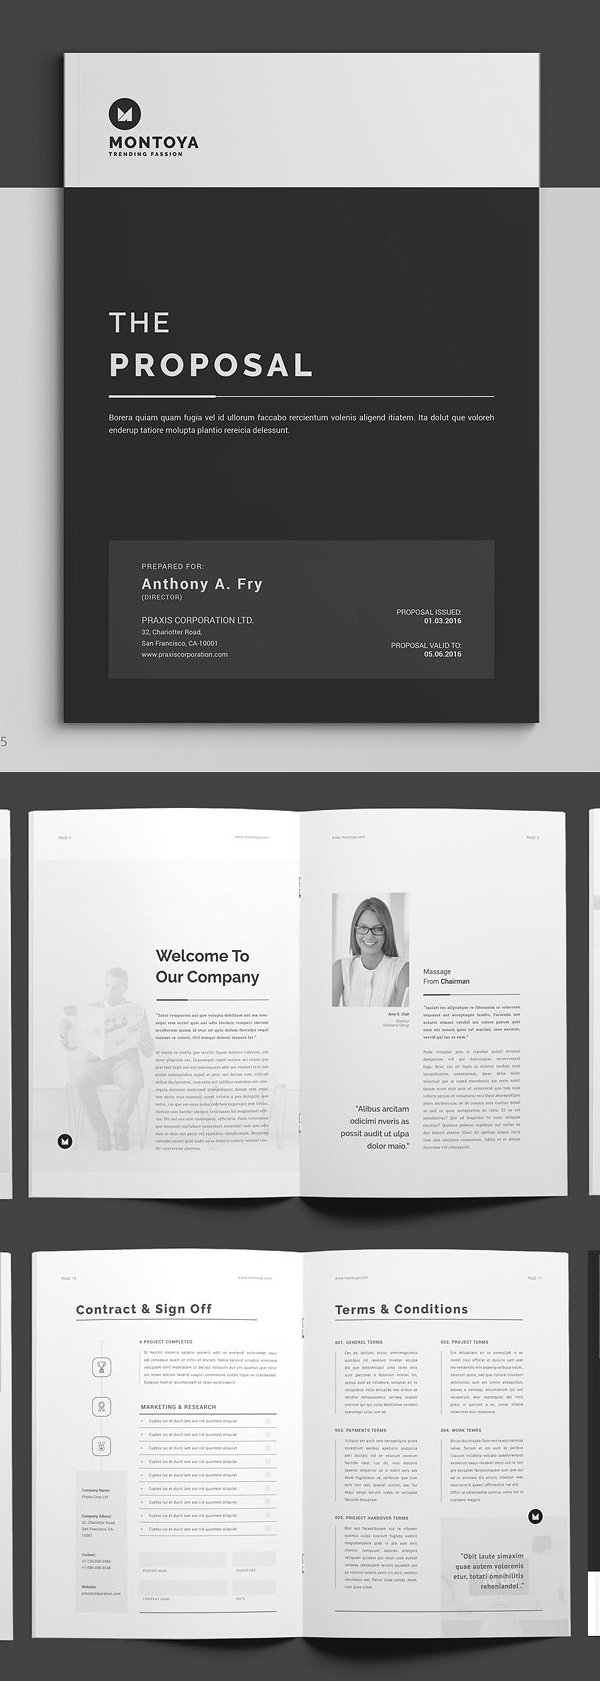 100 Professional Corporate Brochure Templates - 90